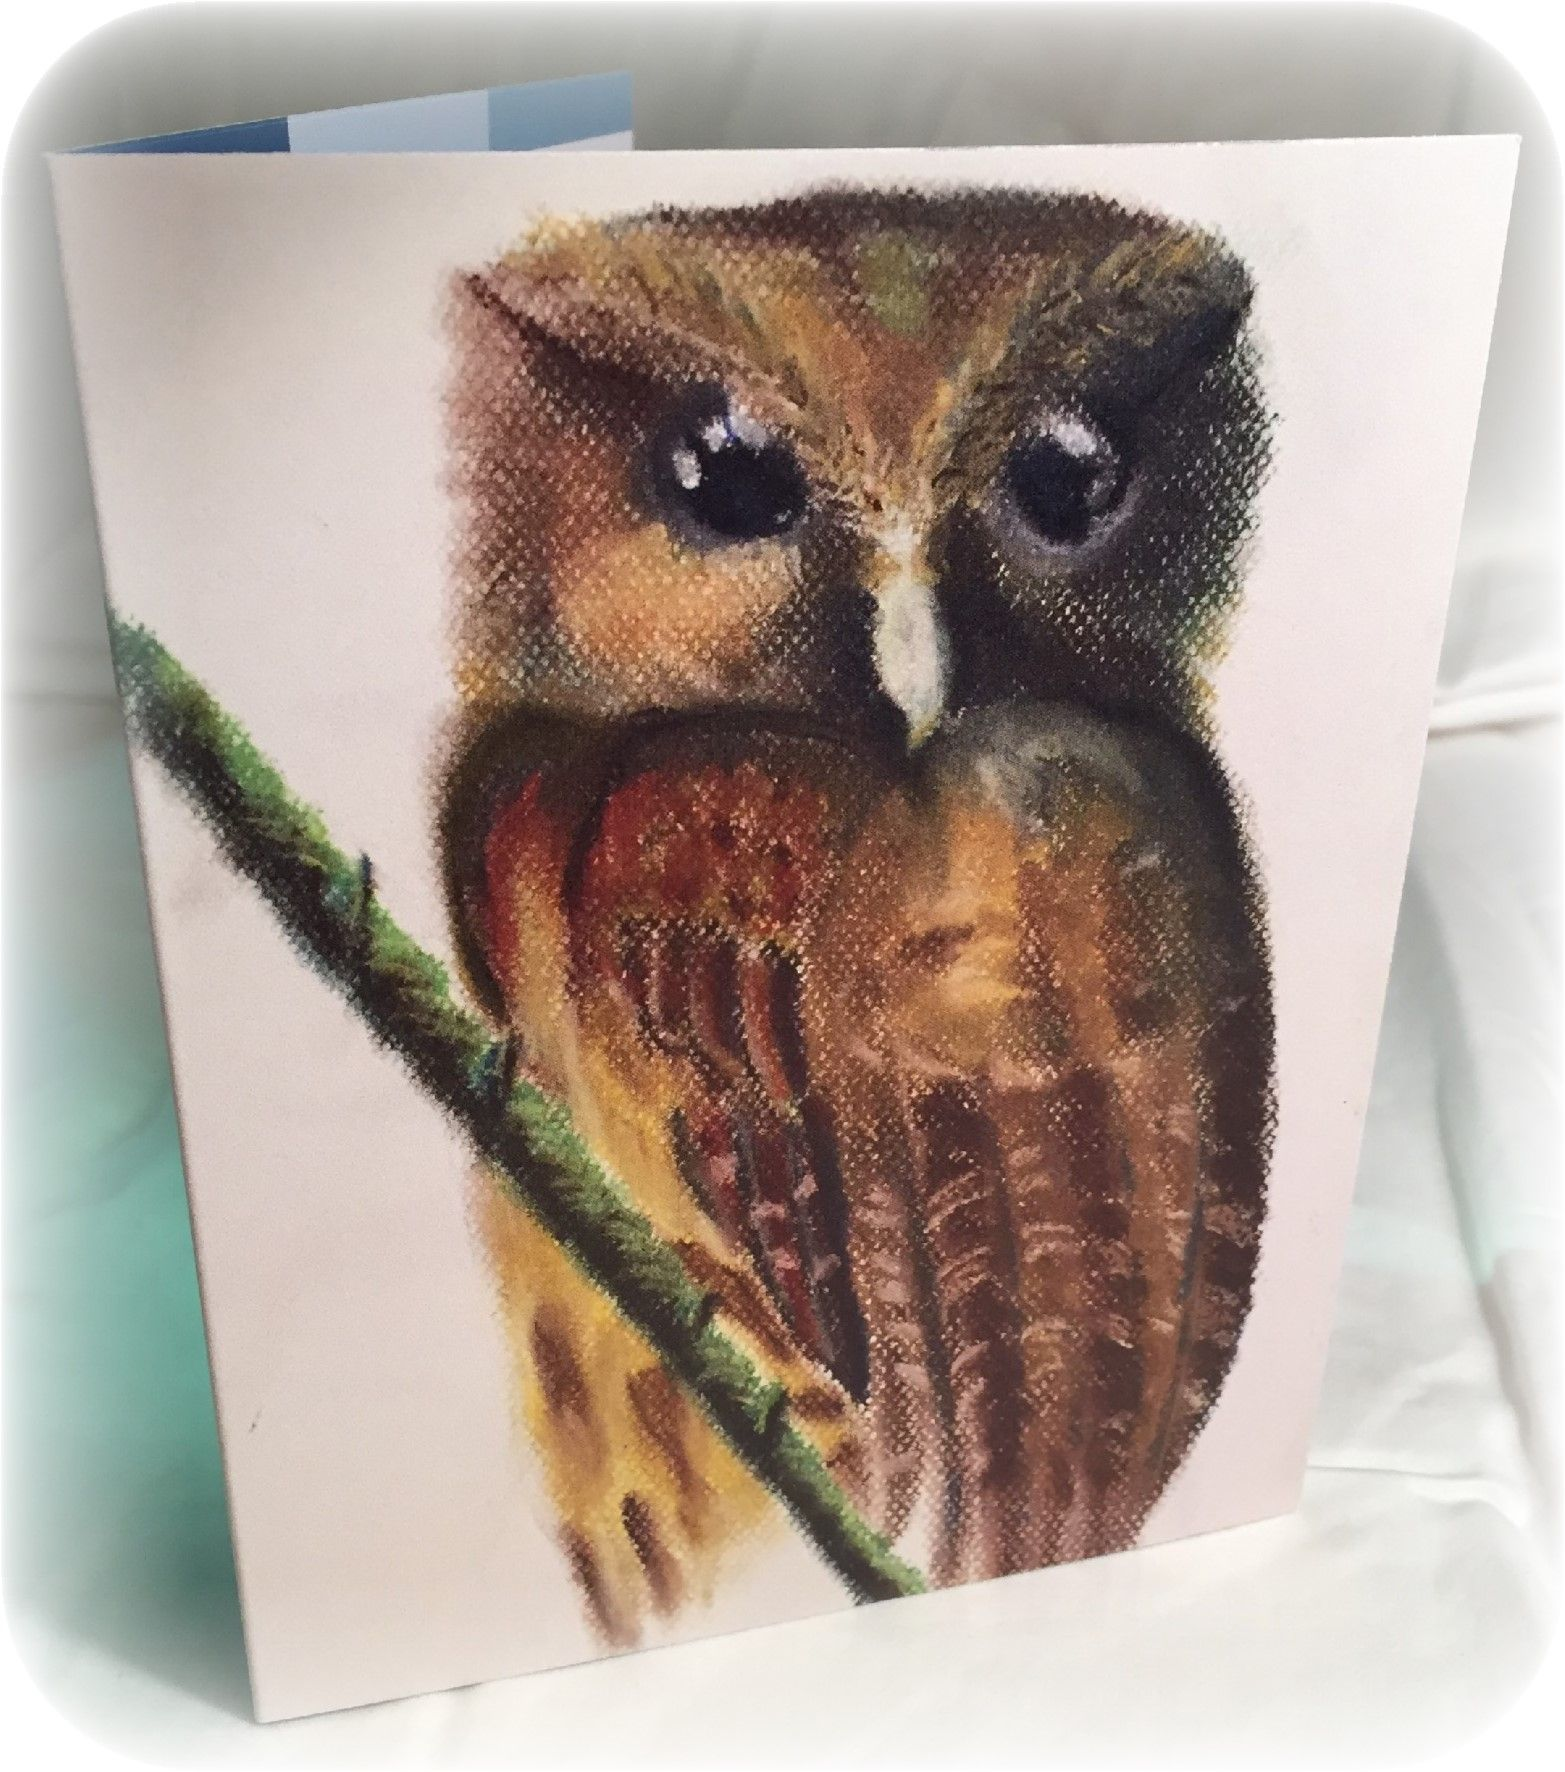 Visit My Page Wingedwatercolorsart To Buy Unique Watercolor